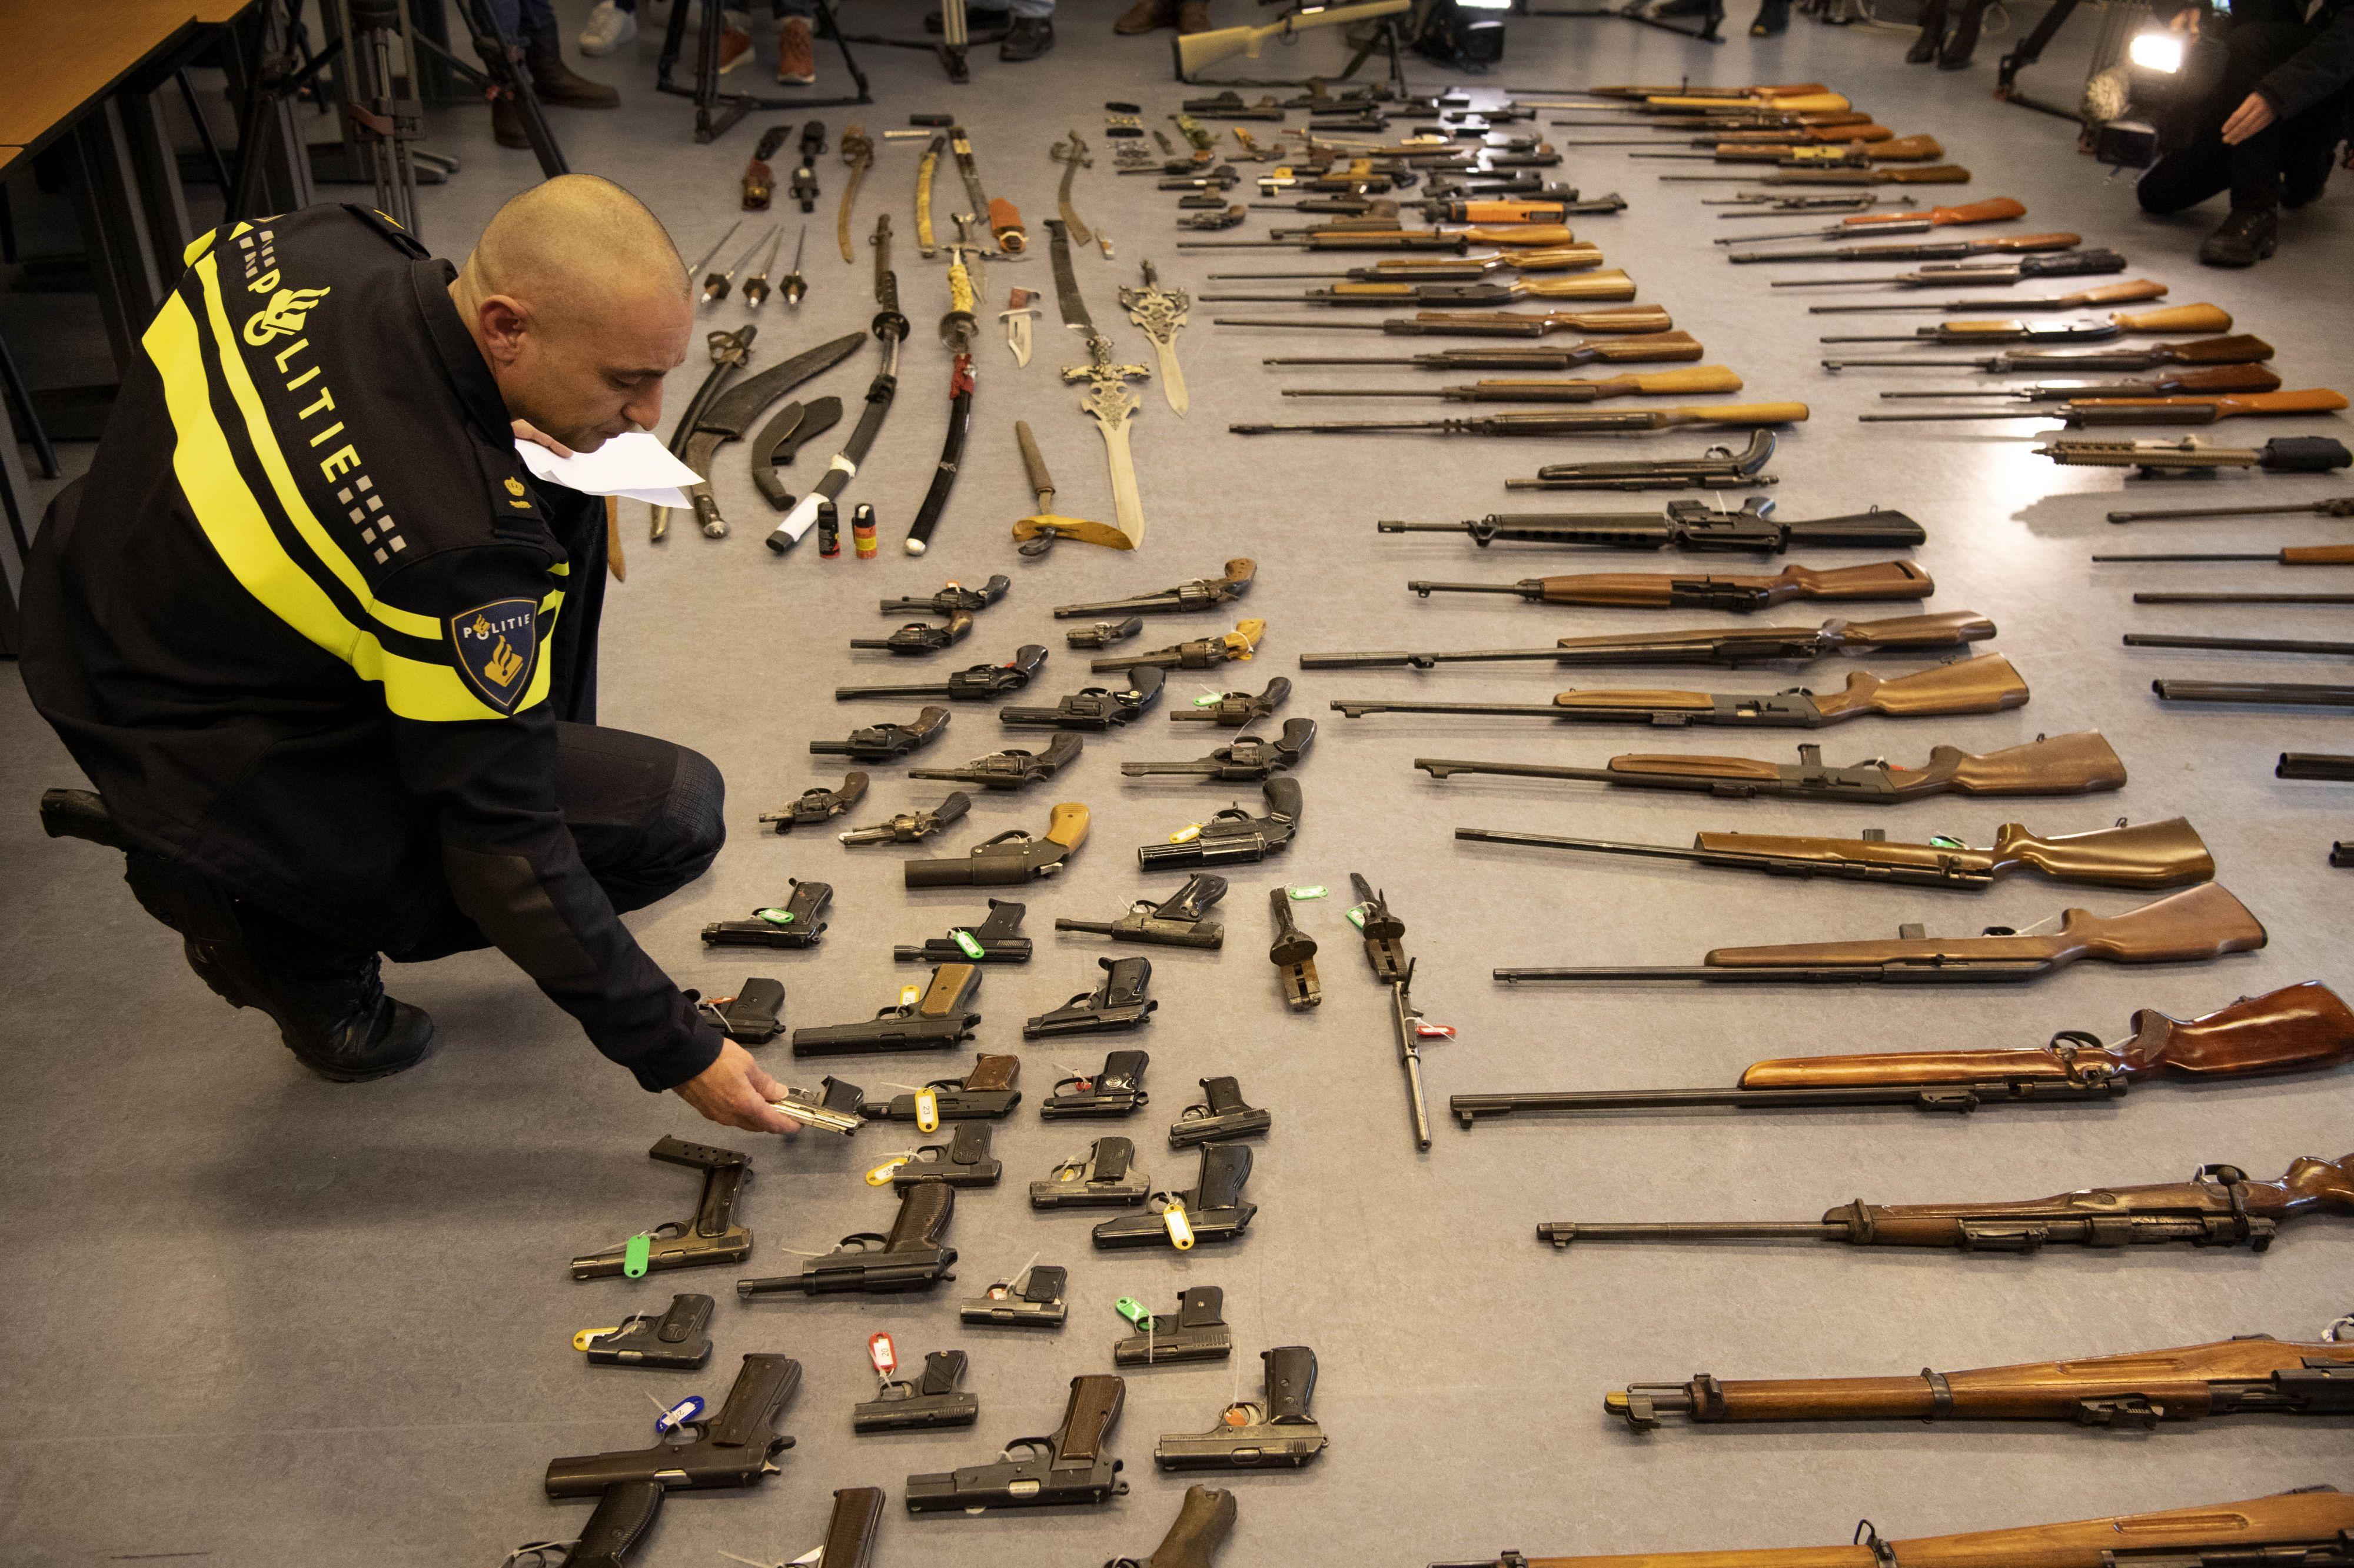 262 wapens ingeleverd bij Rotterdamse politie